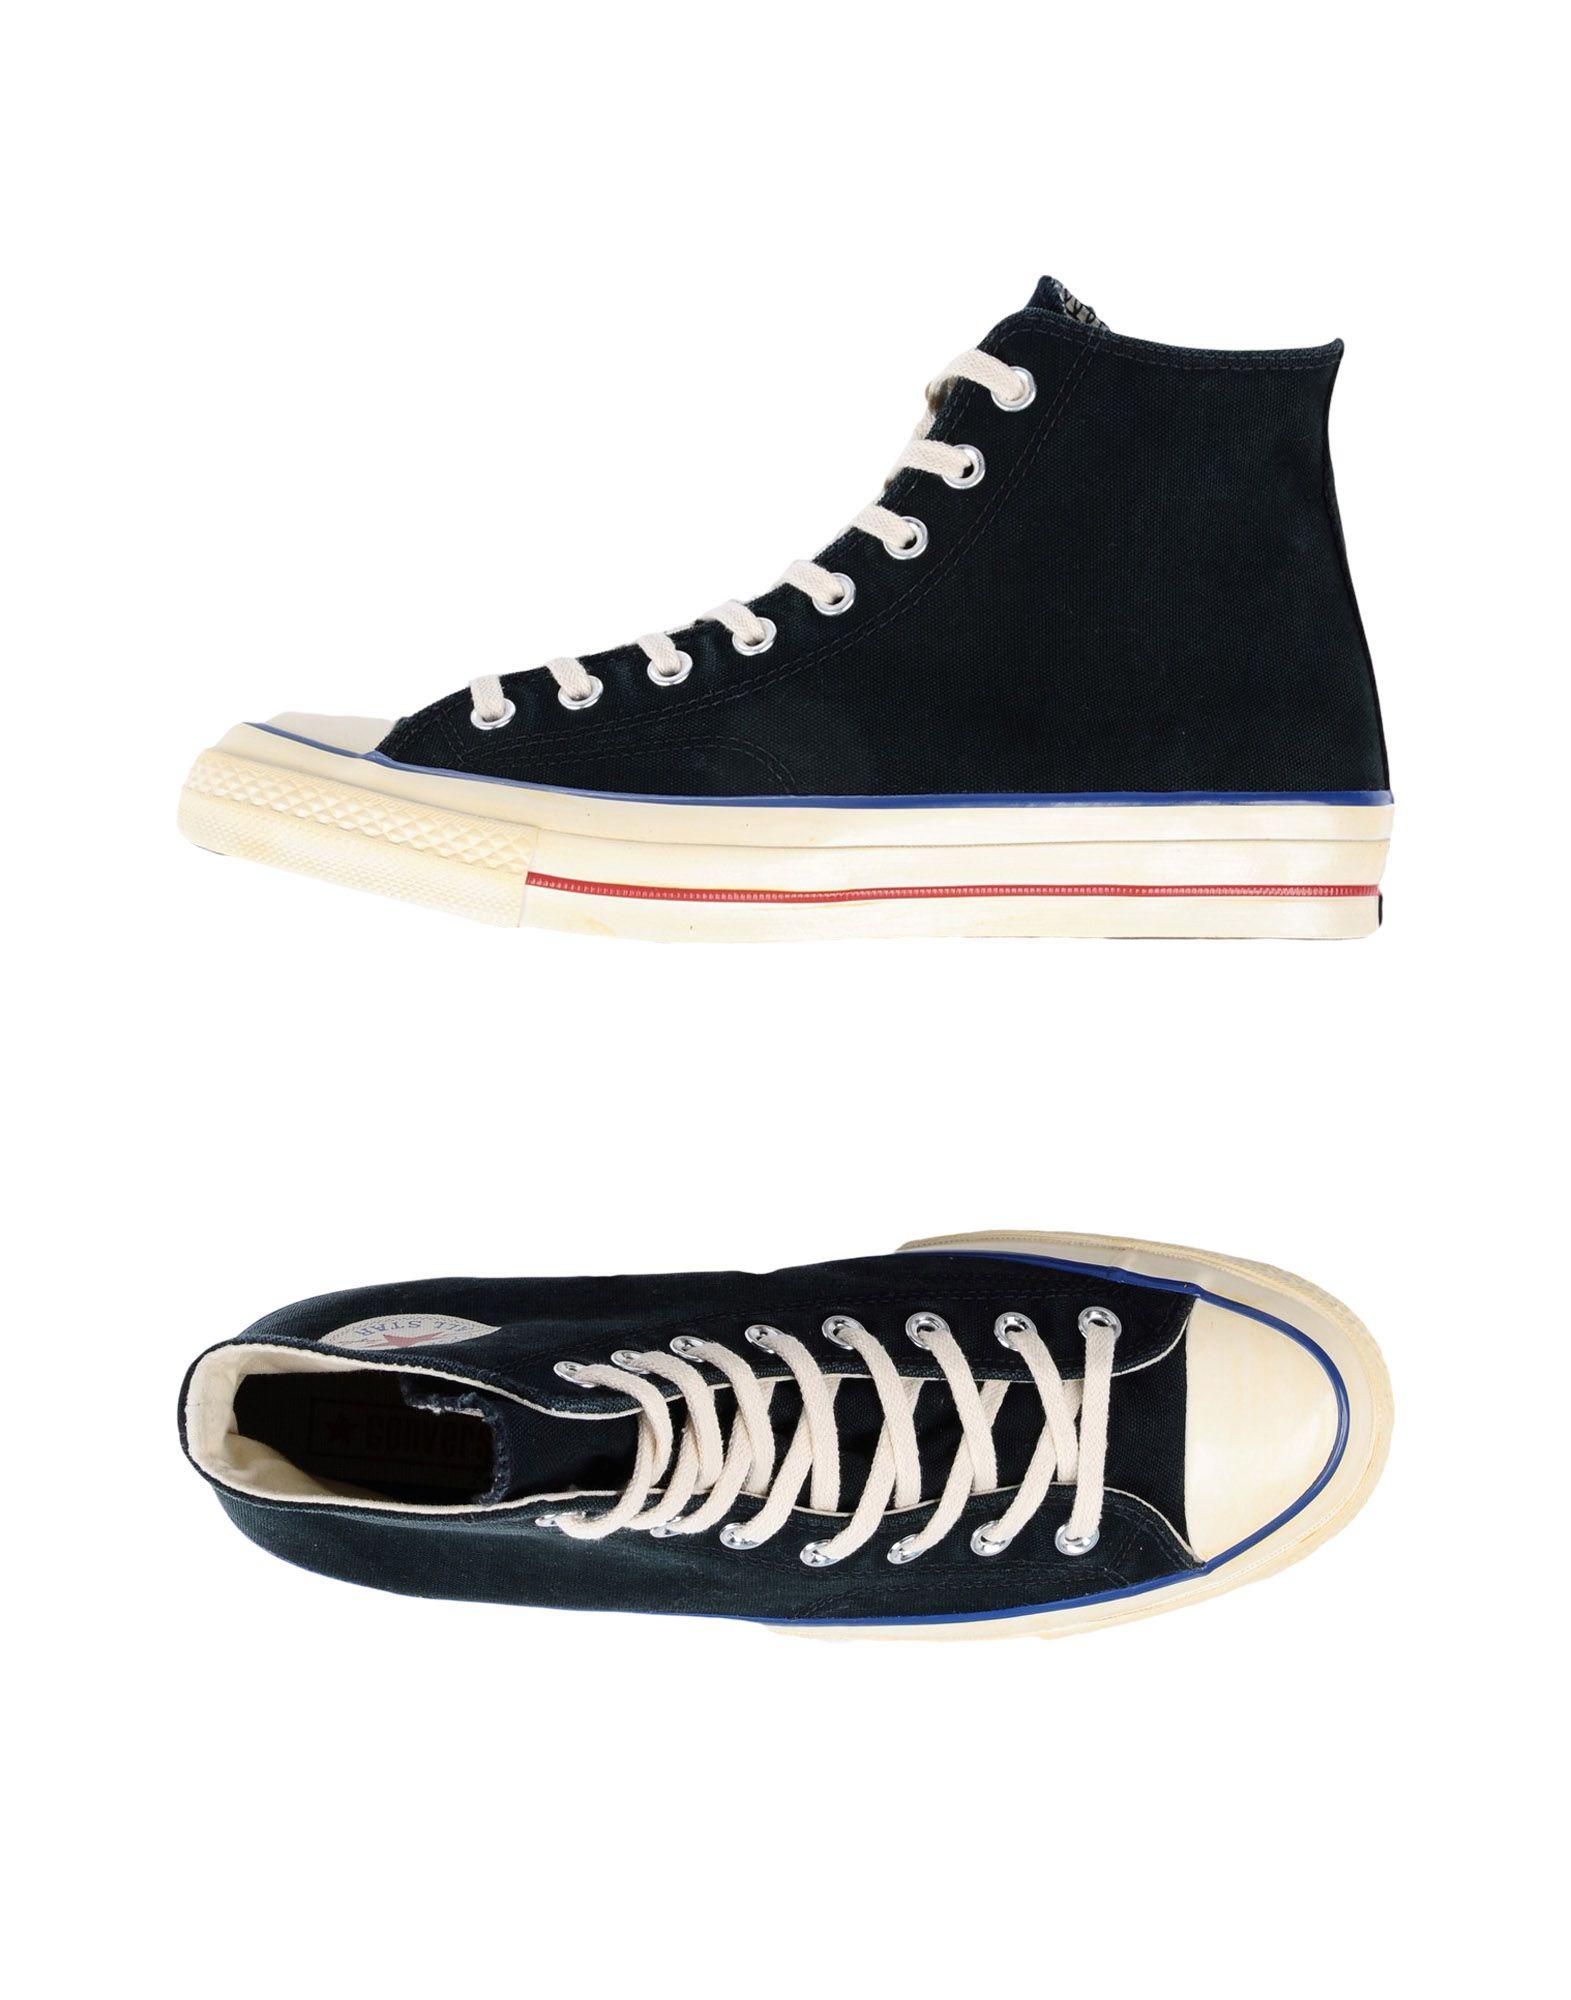 Sneakers Converse All Star Ctas Hi 70'S Vintage '36 Canvas - Homme - Sneakers Converse All Star sur